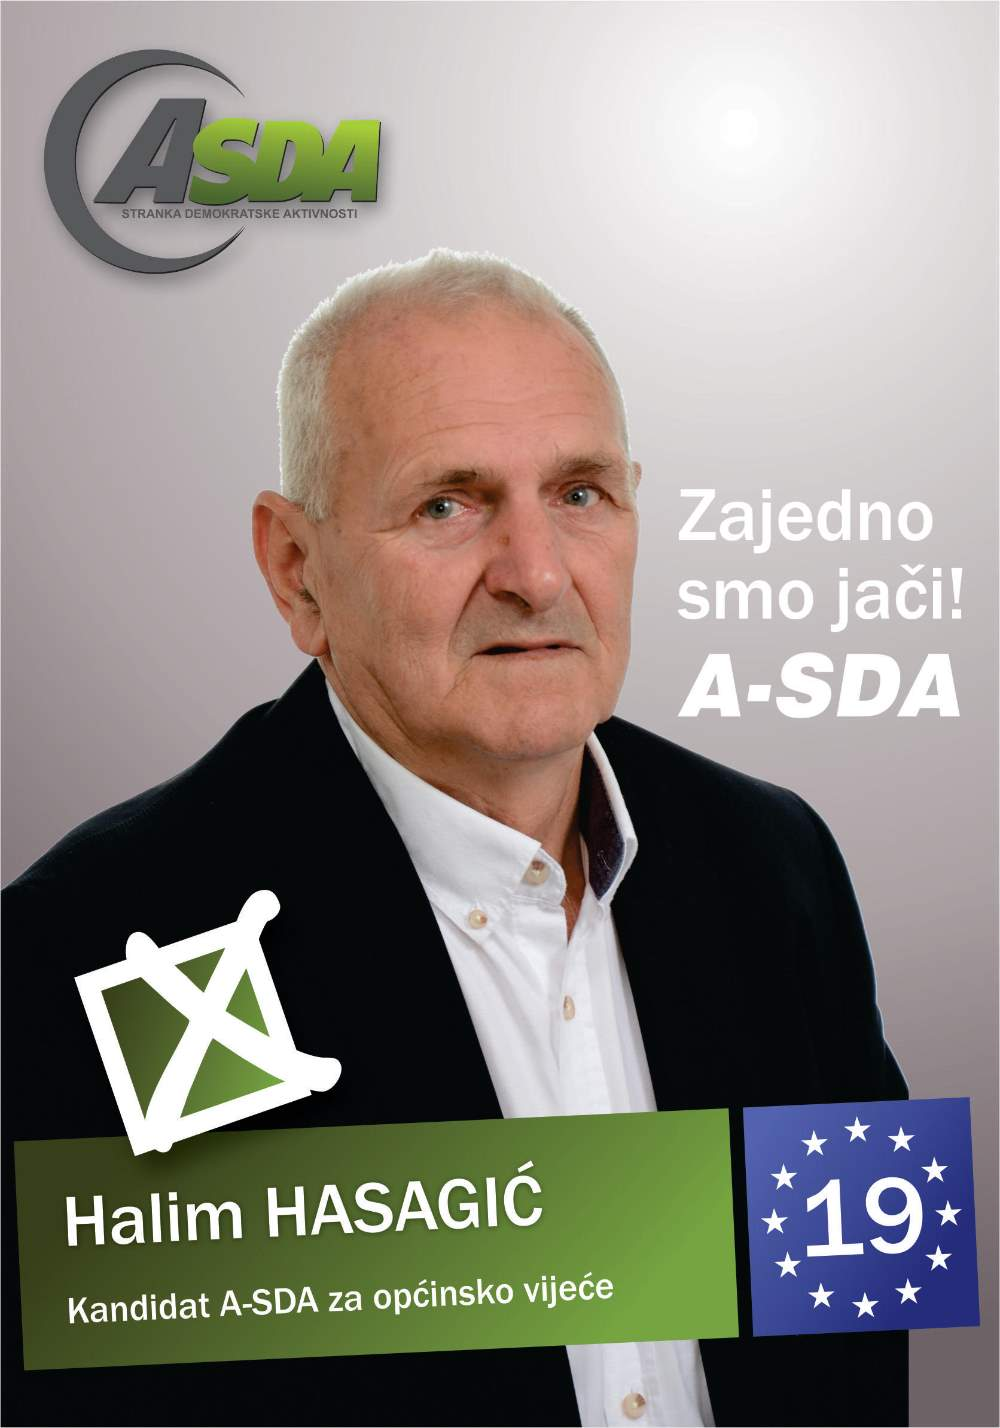 Halim Hasagić